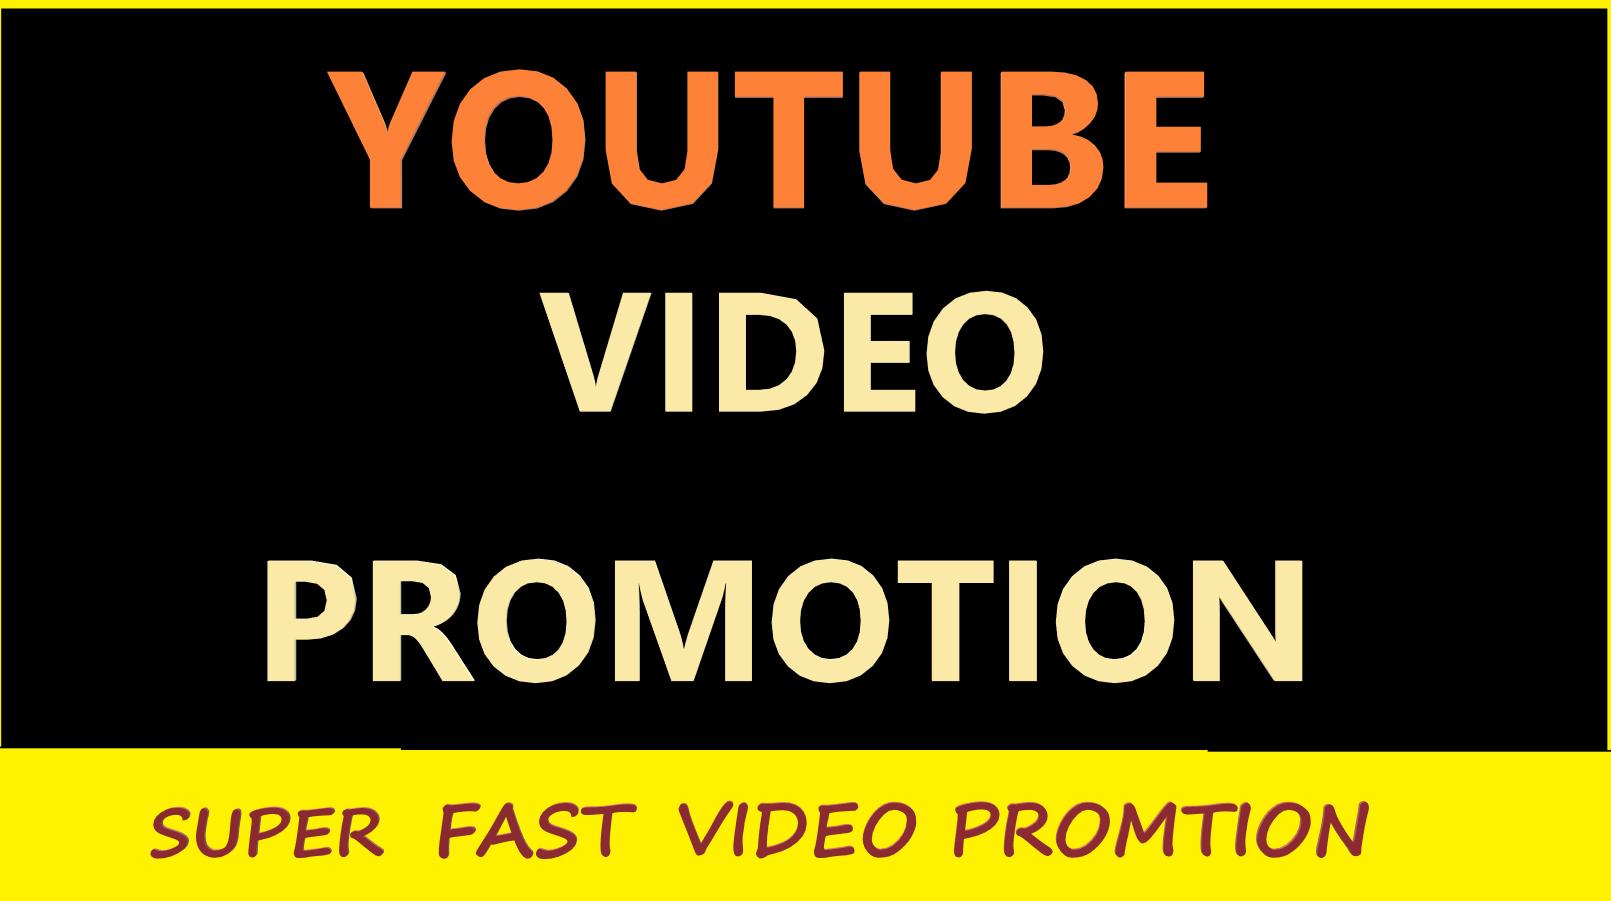 I will do massive YouTube video promotion Improve video ranking